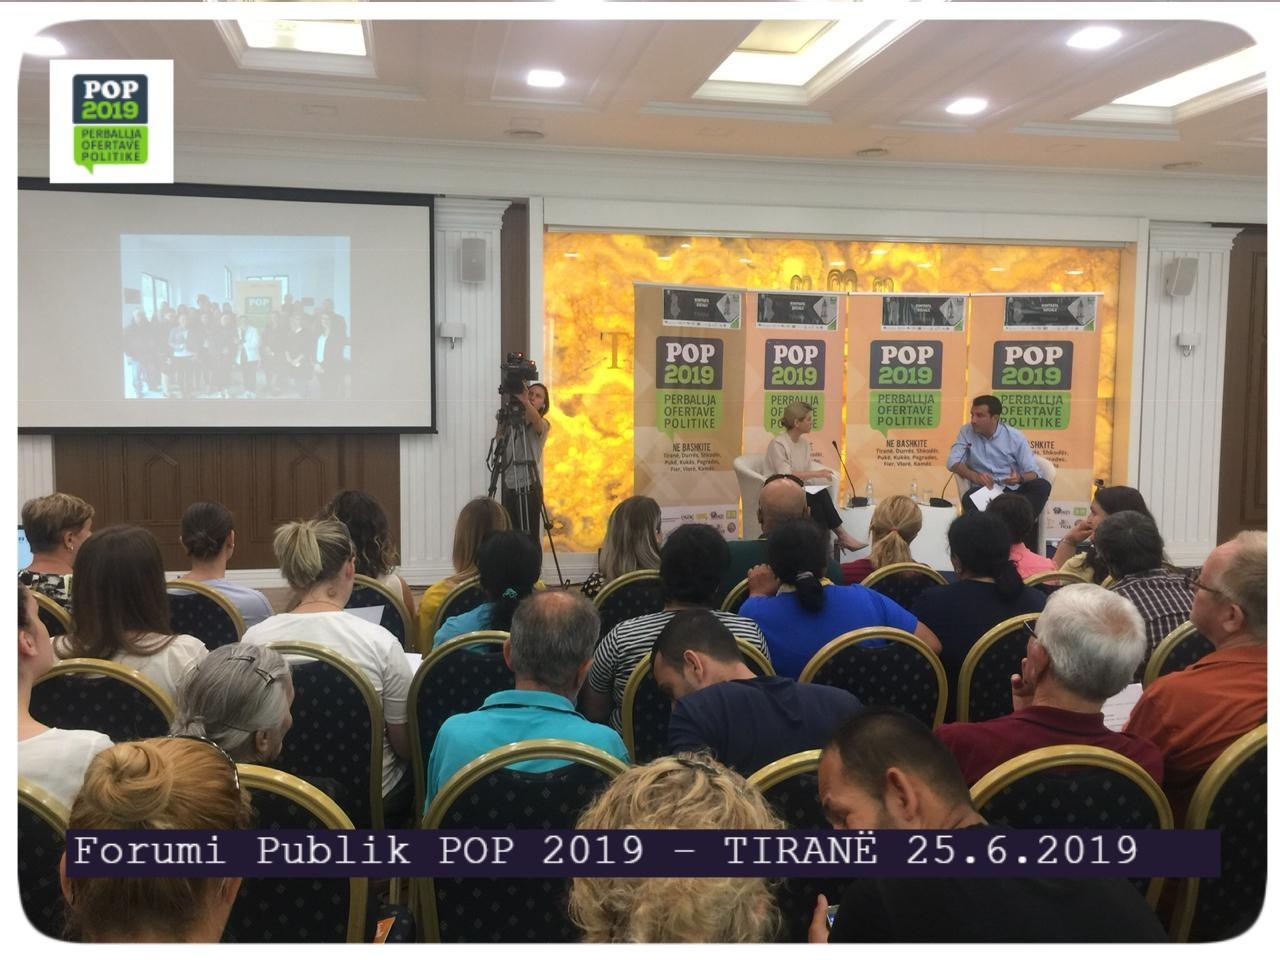 Forumi Publik POP 2019 – Tiranë